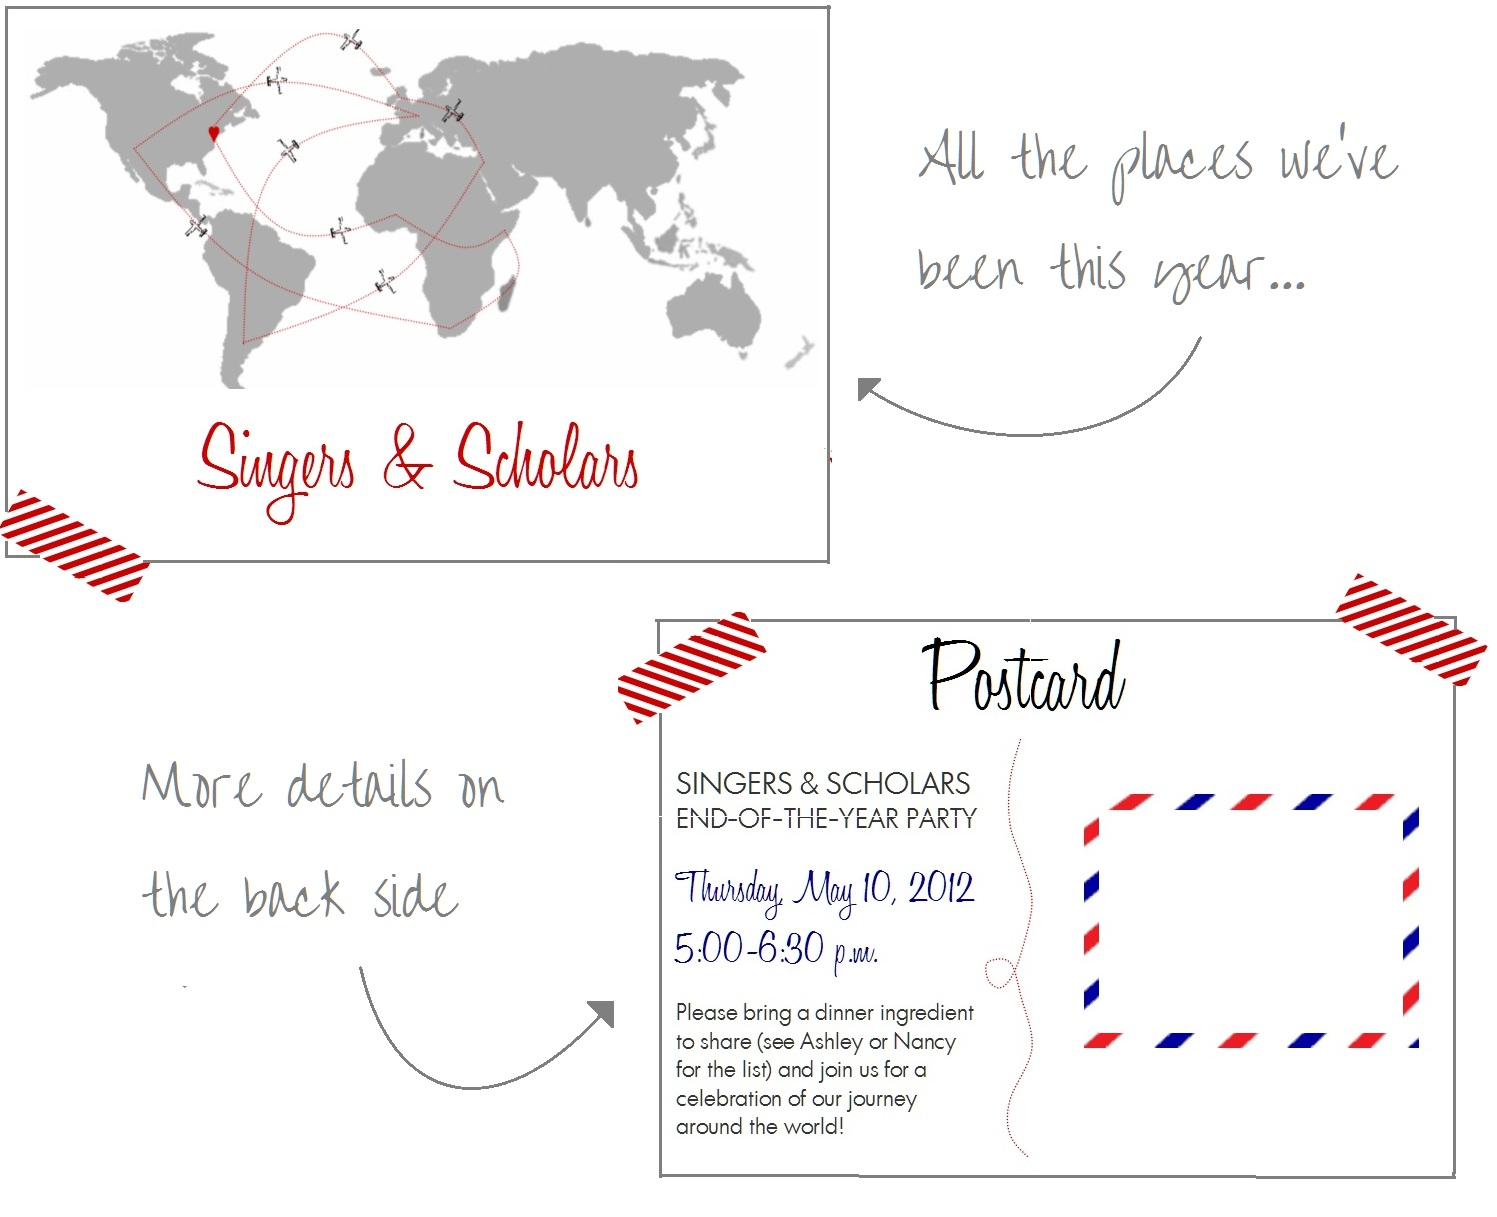 postcard graphic